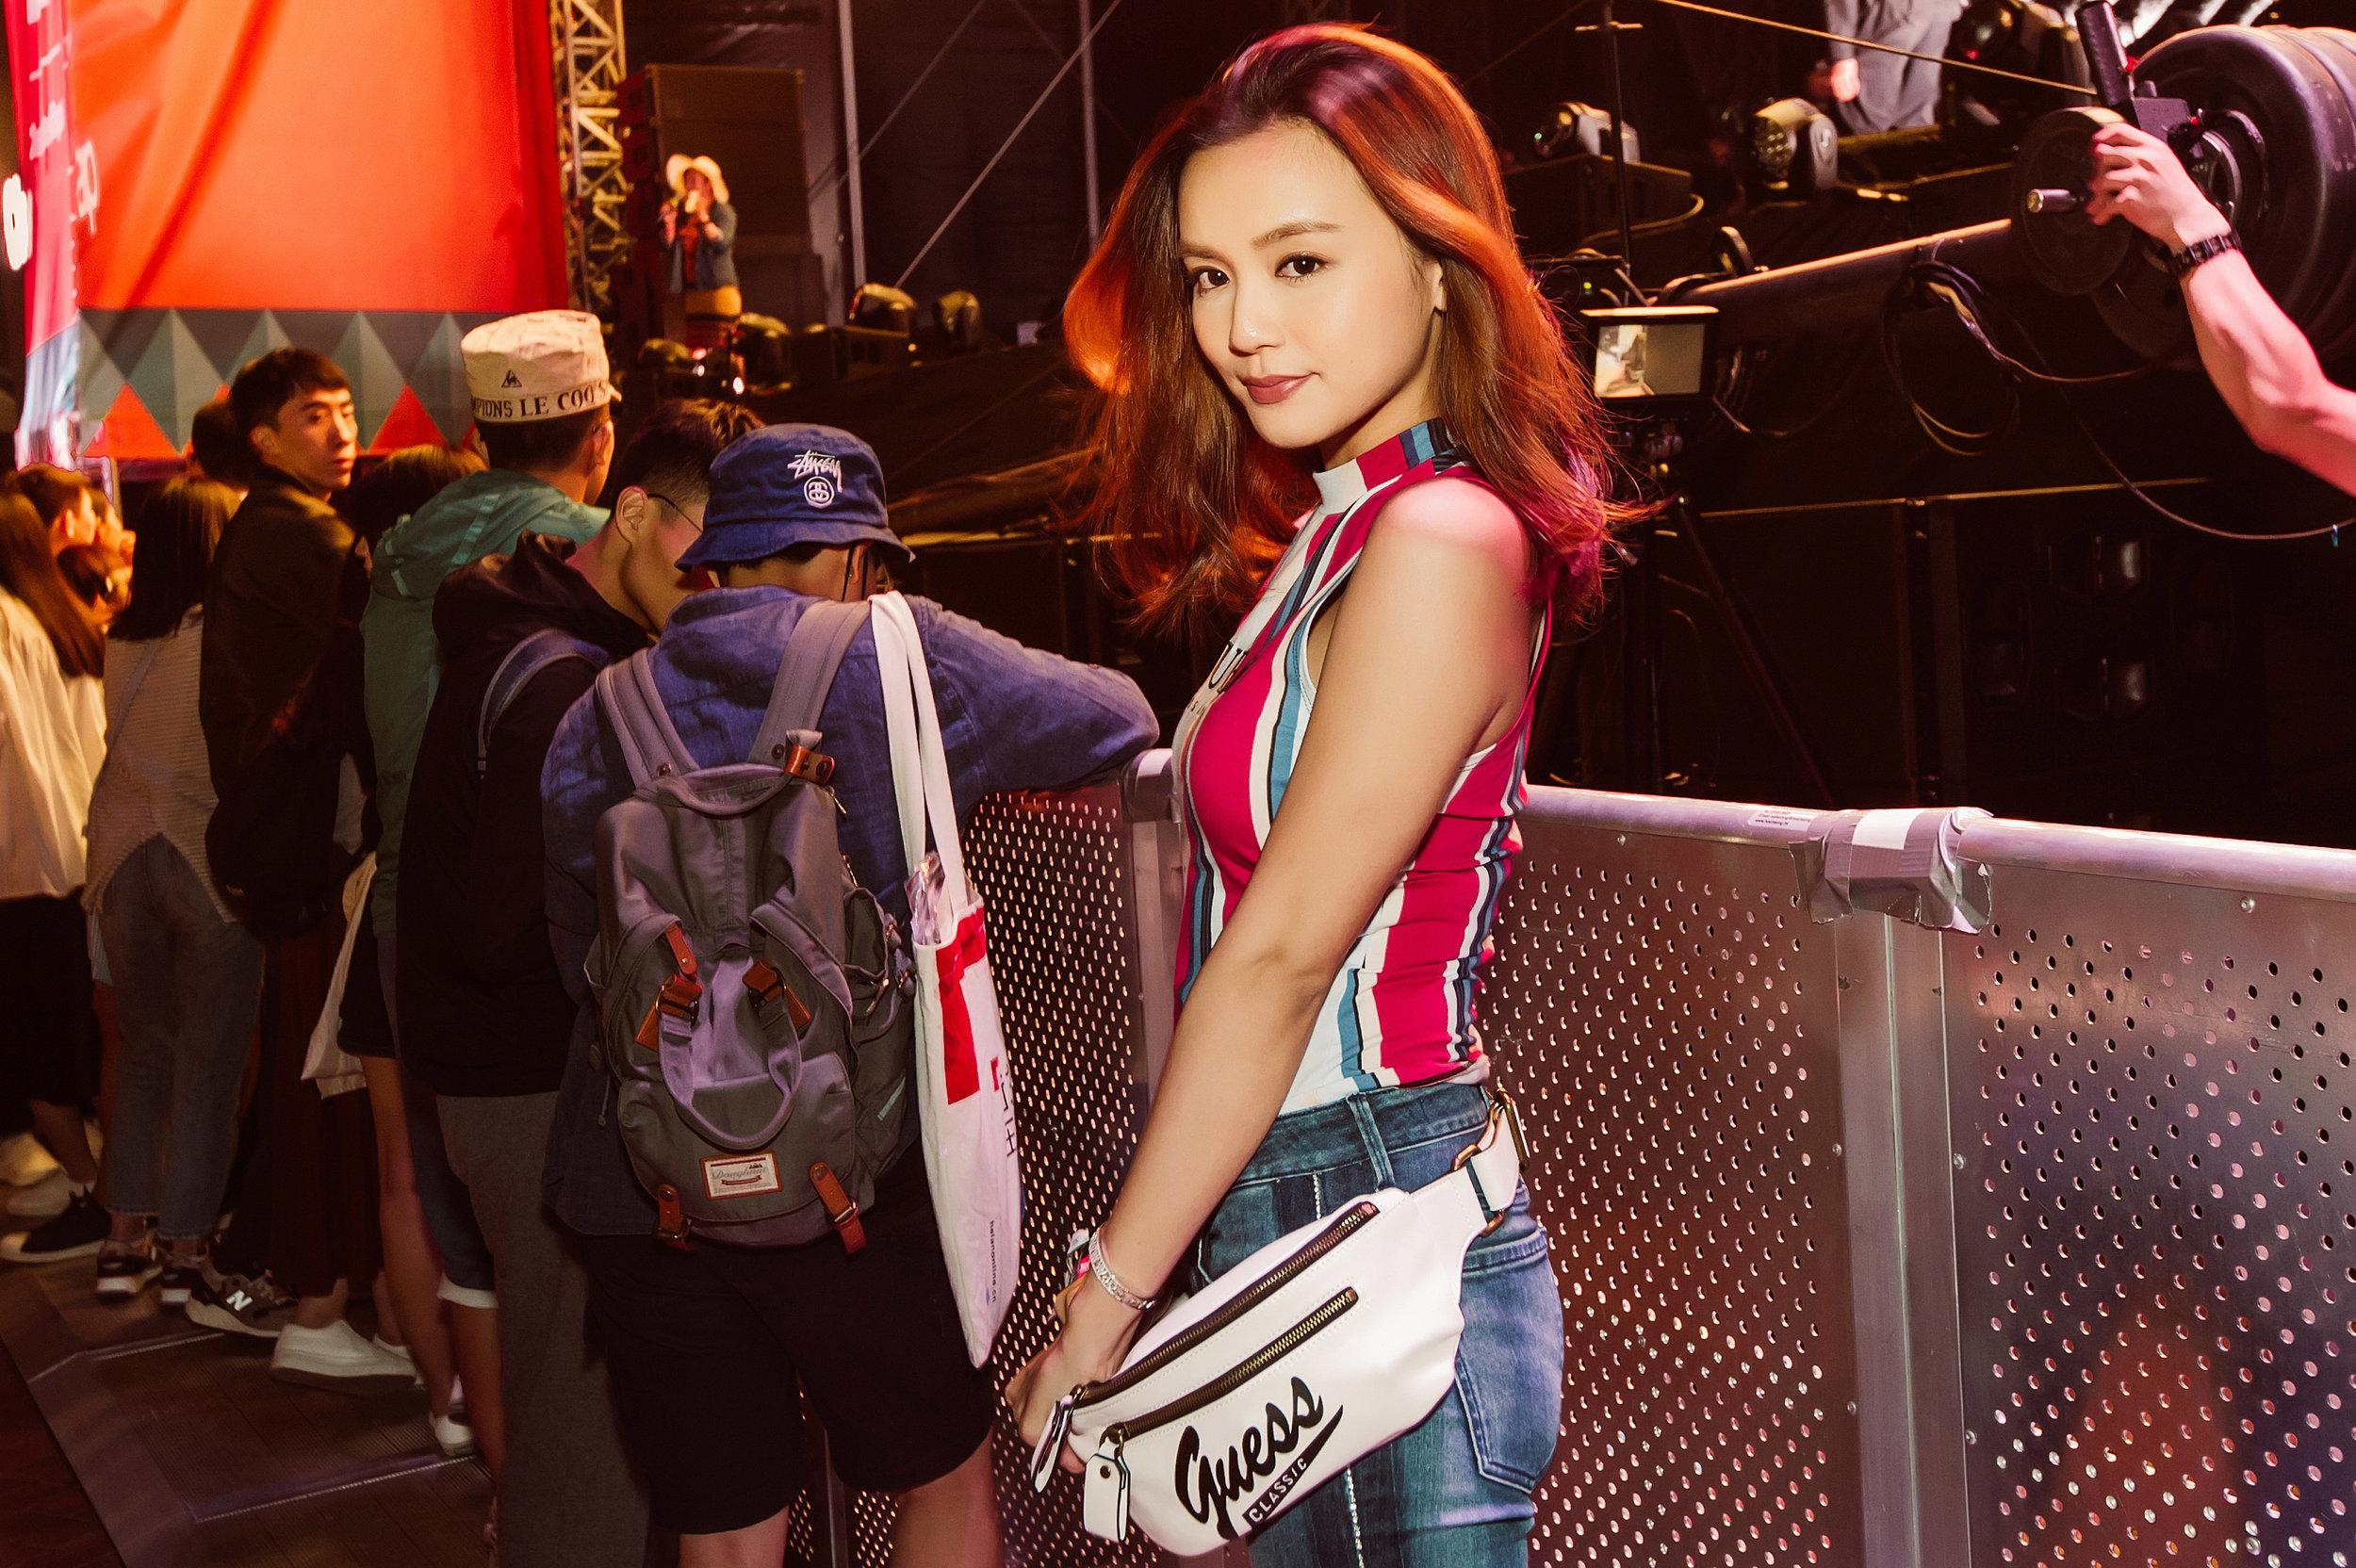 Christy Lai